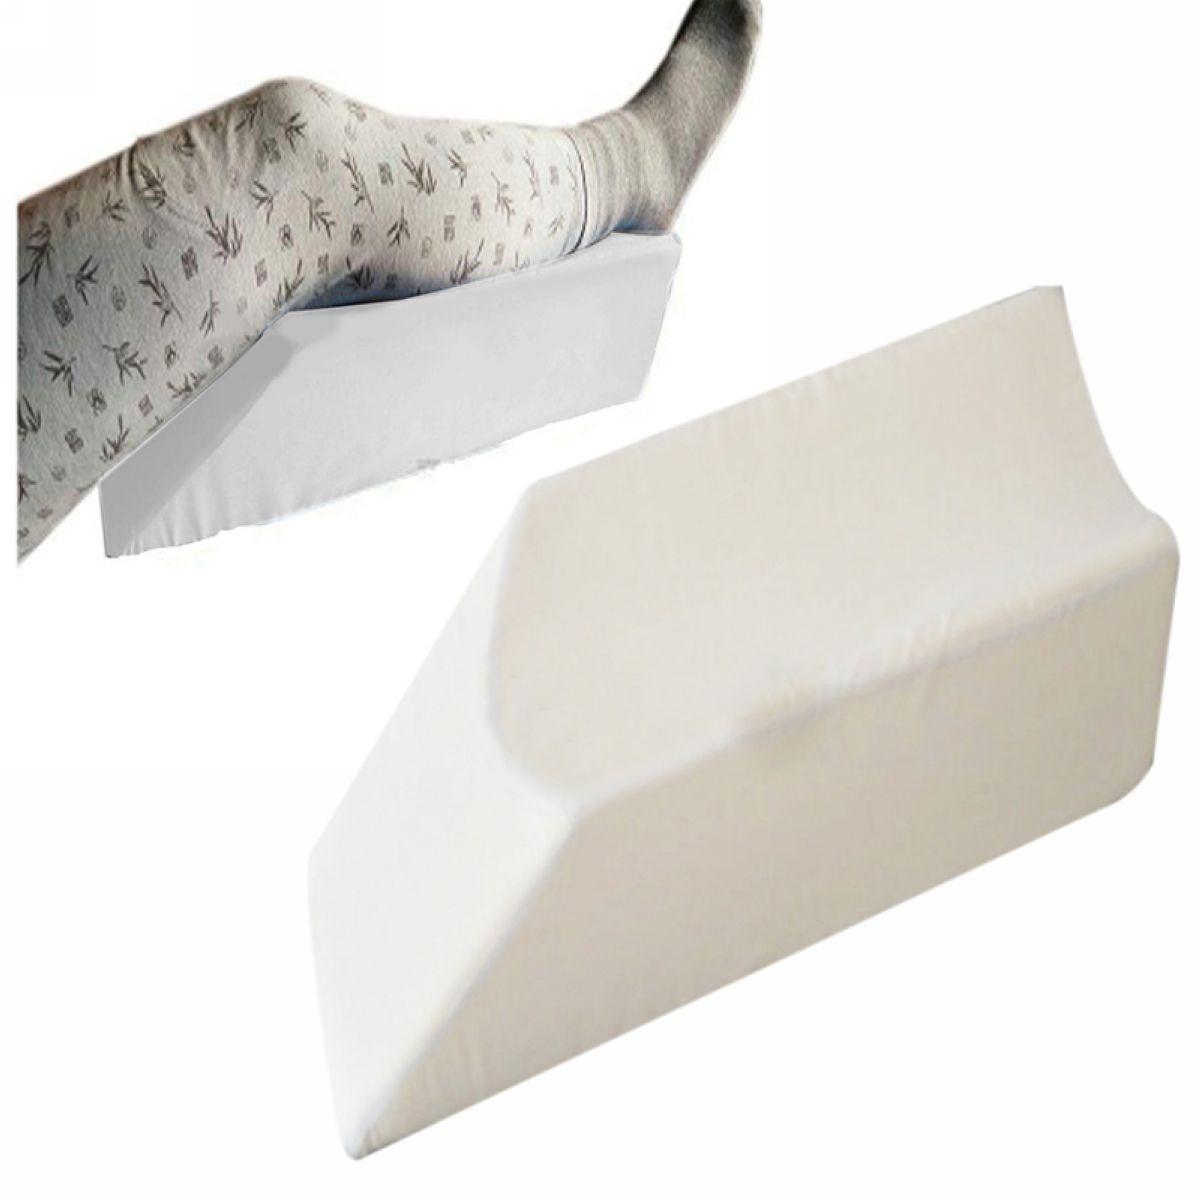 new elevating knee leg rest support mayitr gel memory foam wedge bed